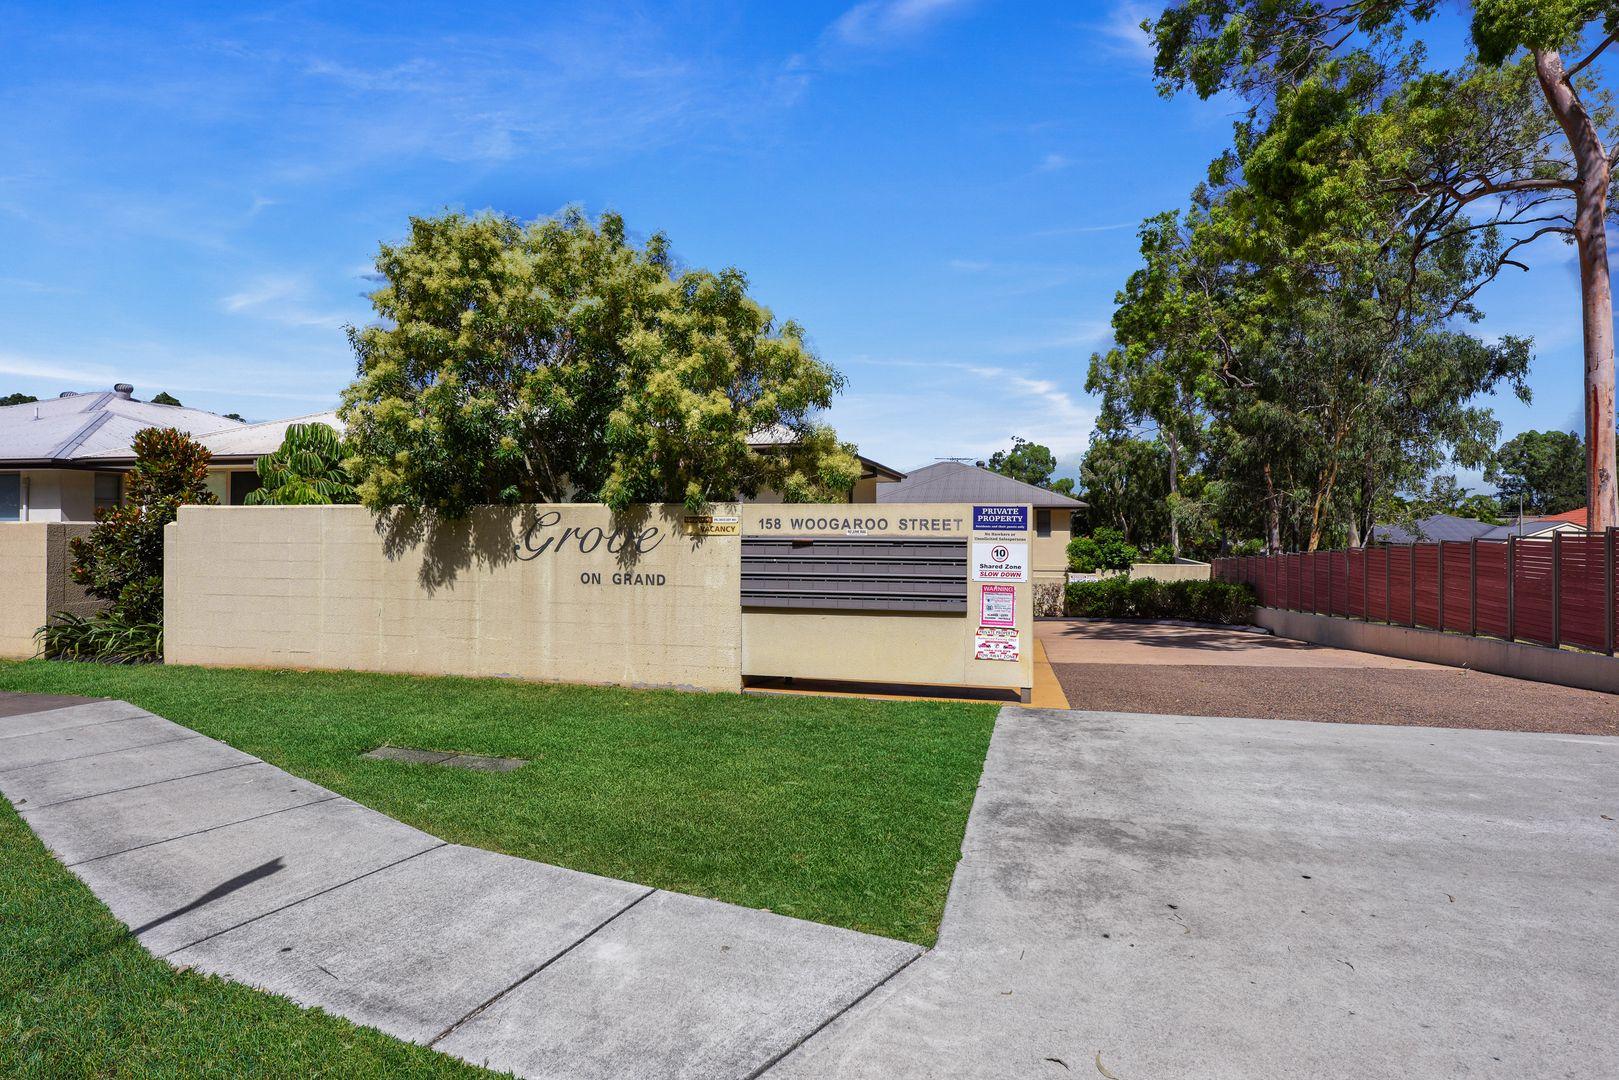 12/158 Woogaroo Street, Forest Lake QLD 4078, Image 2